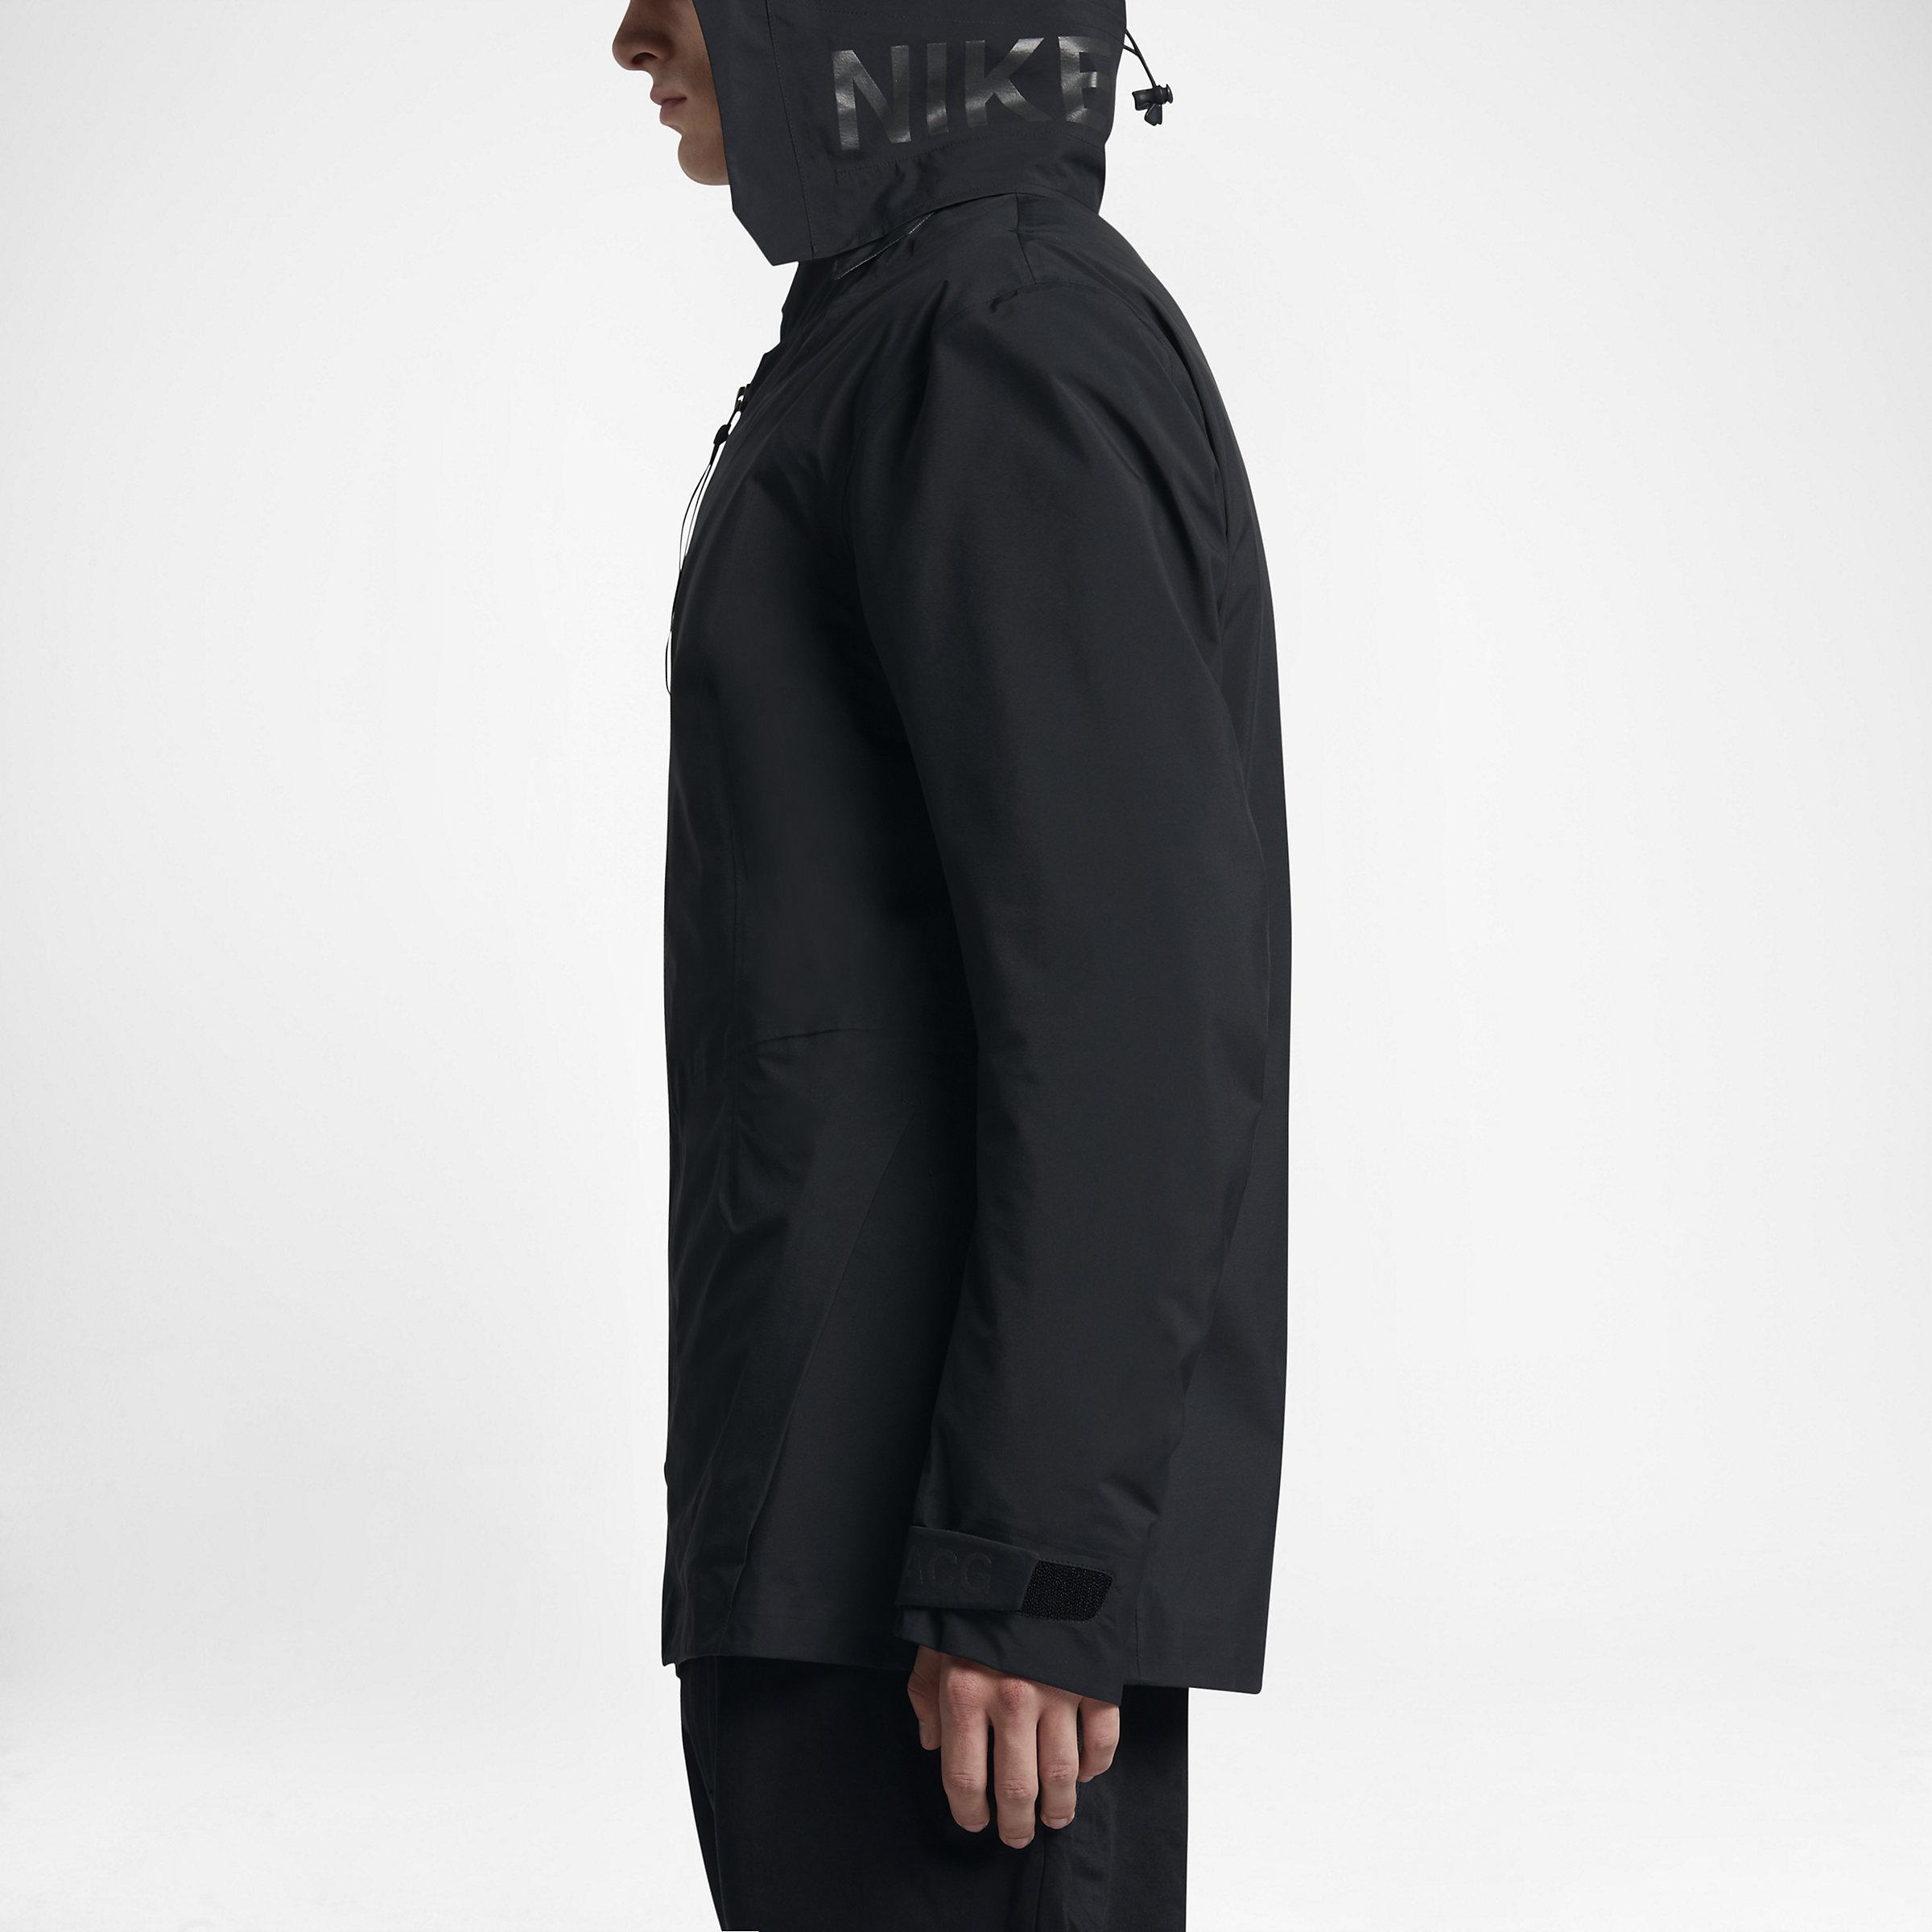 Nike Synthetic Lab Acg System Blazer in Black,Black (Black) for Men